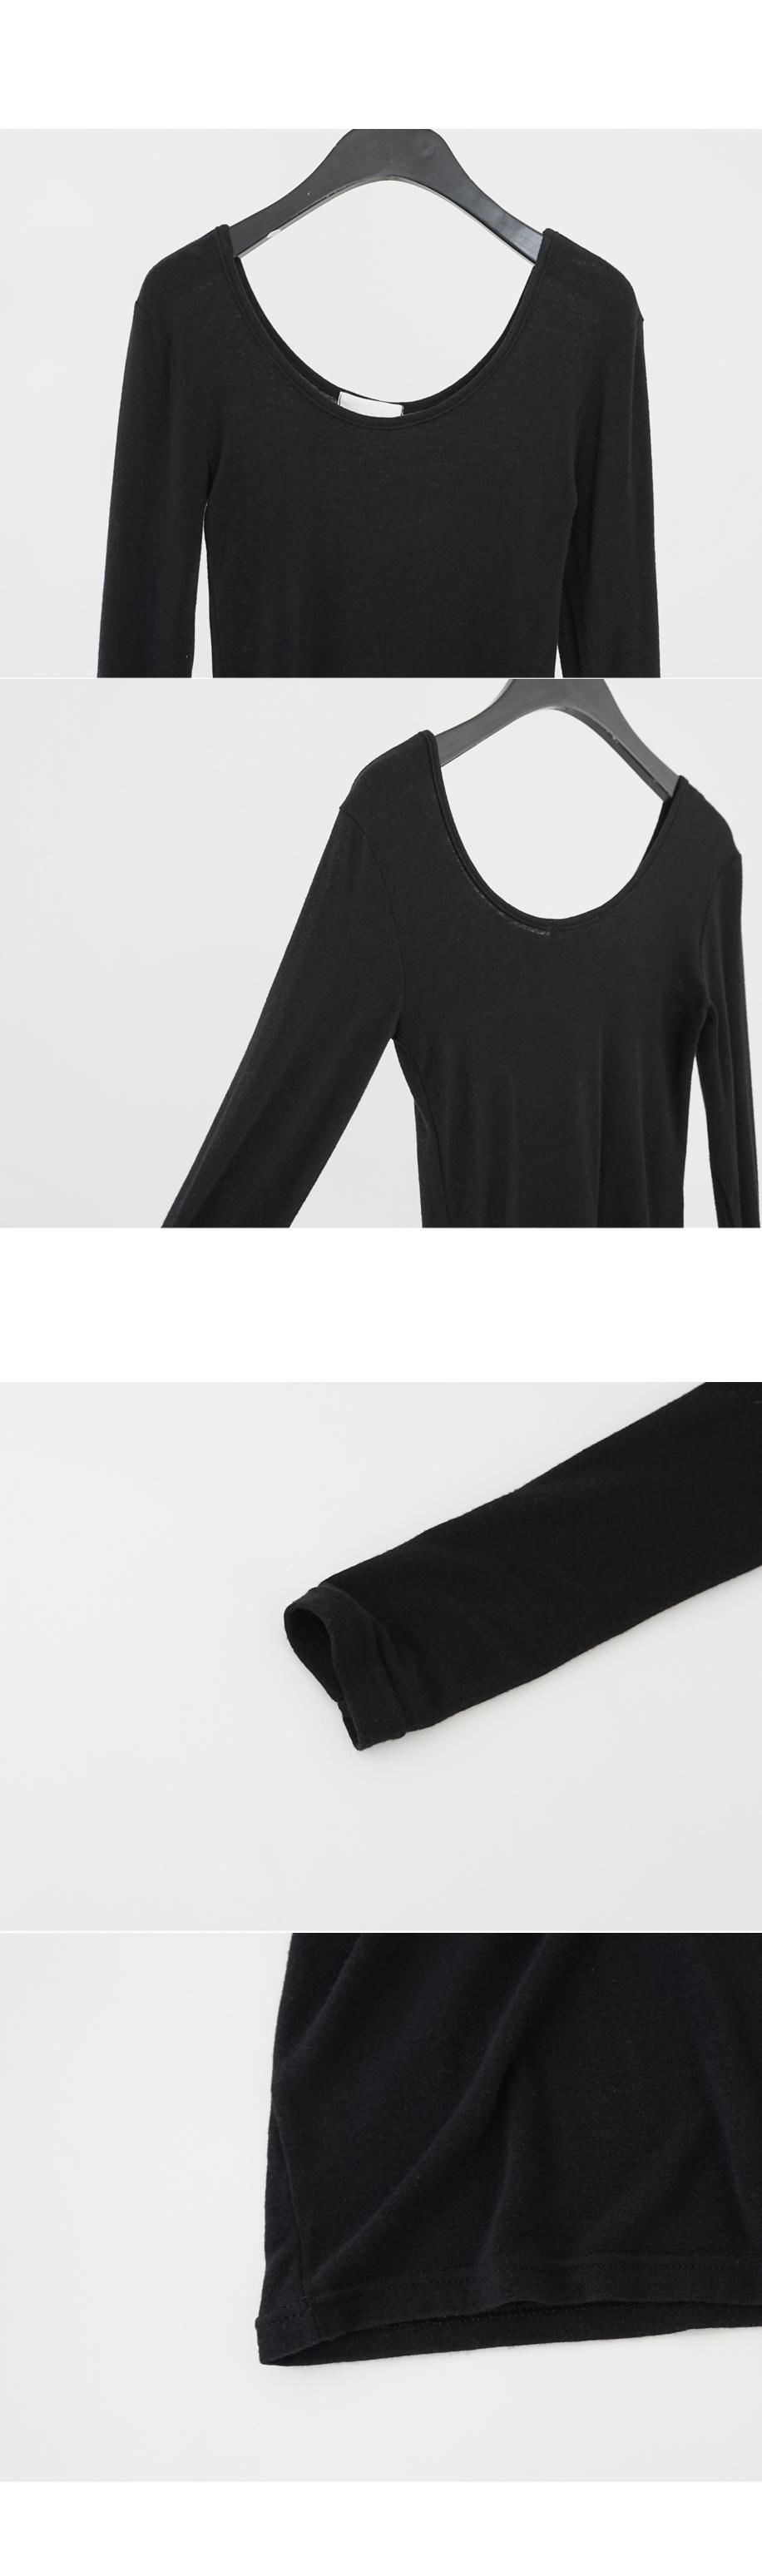 deep U-neck stretchy tee (5colors)